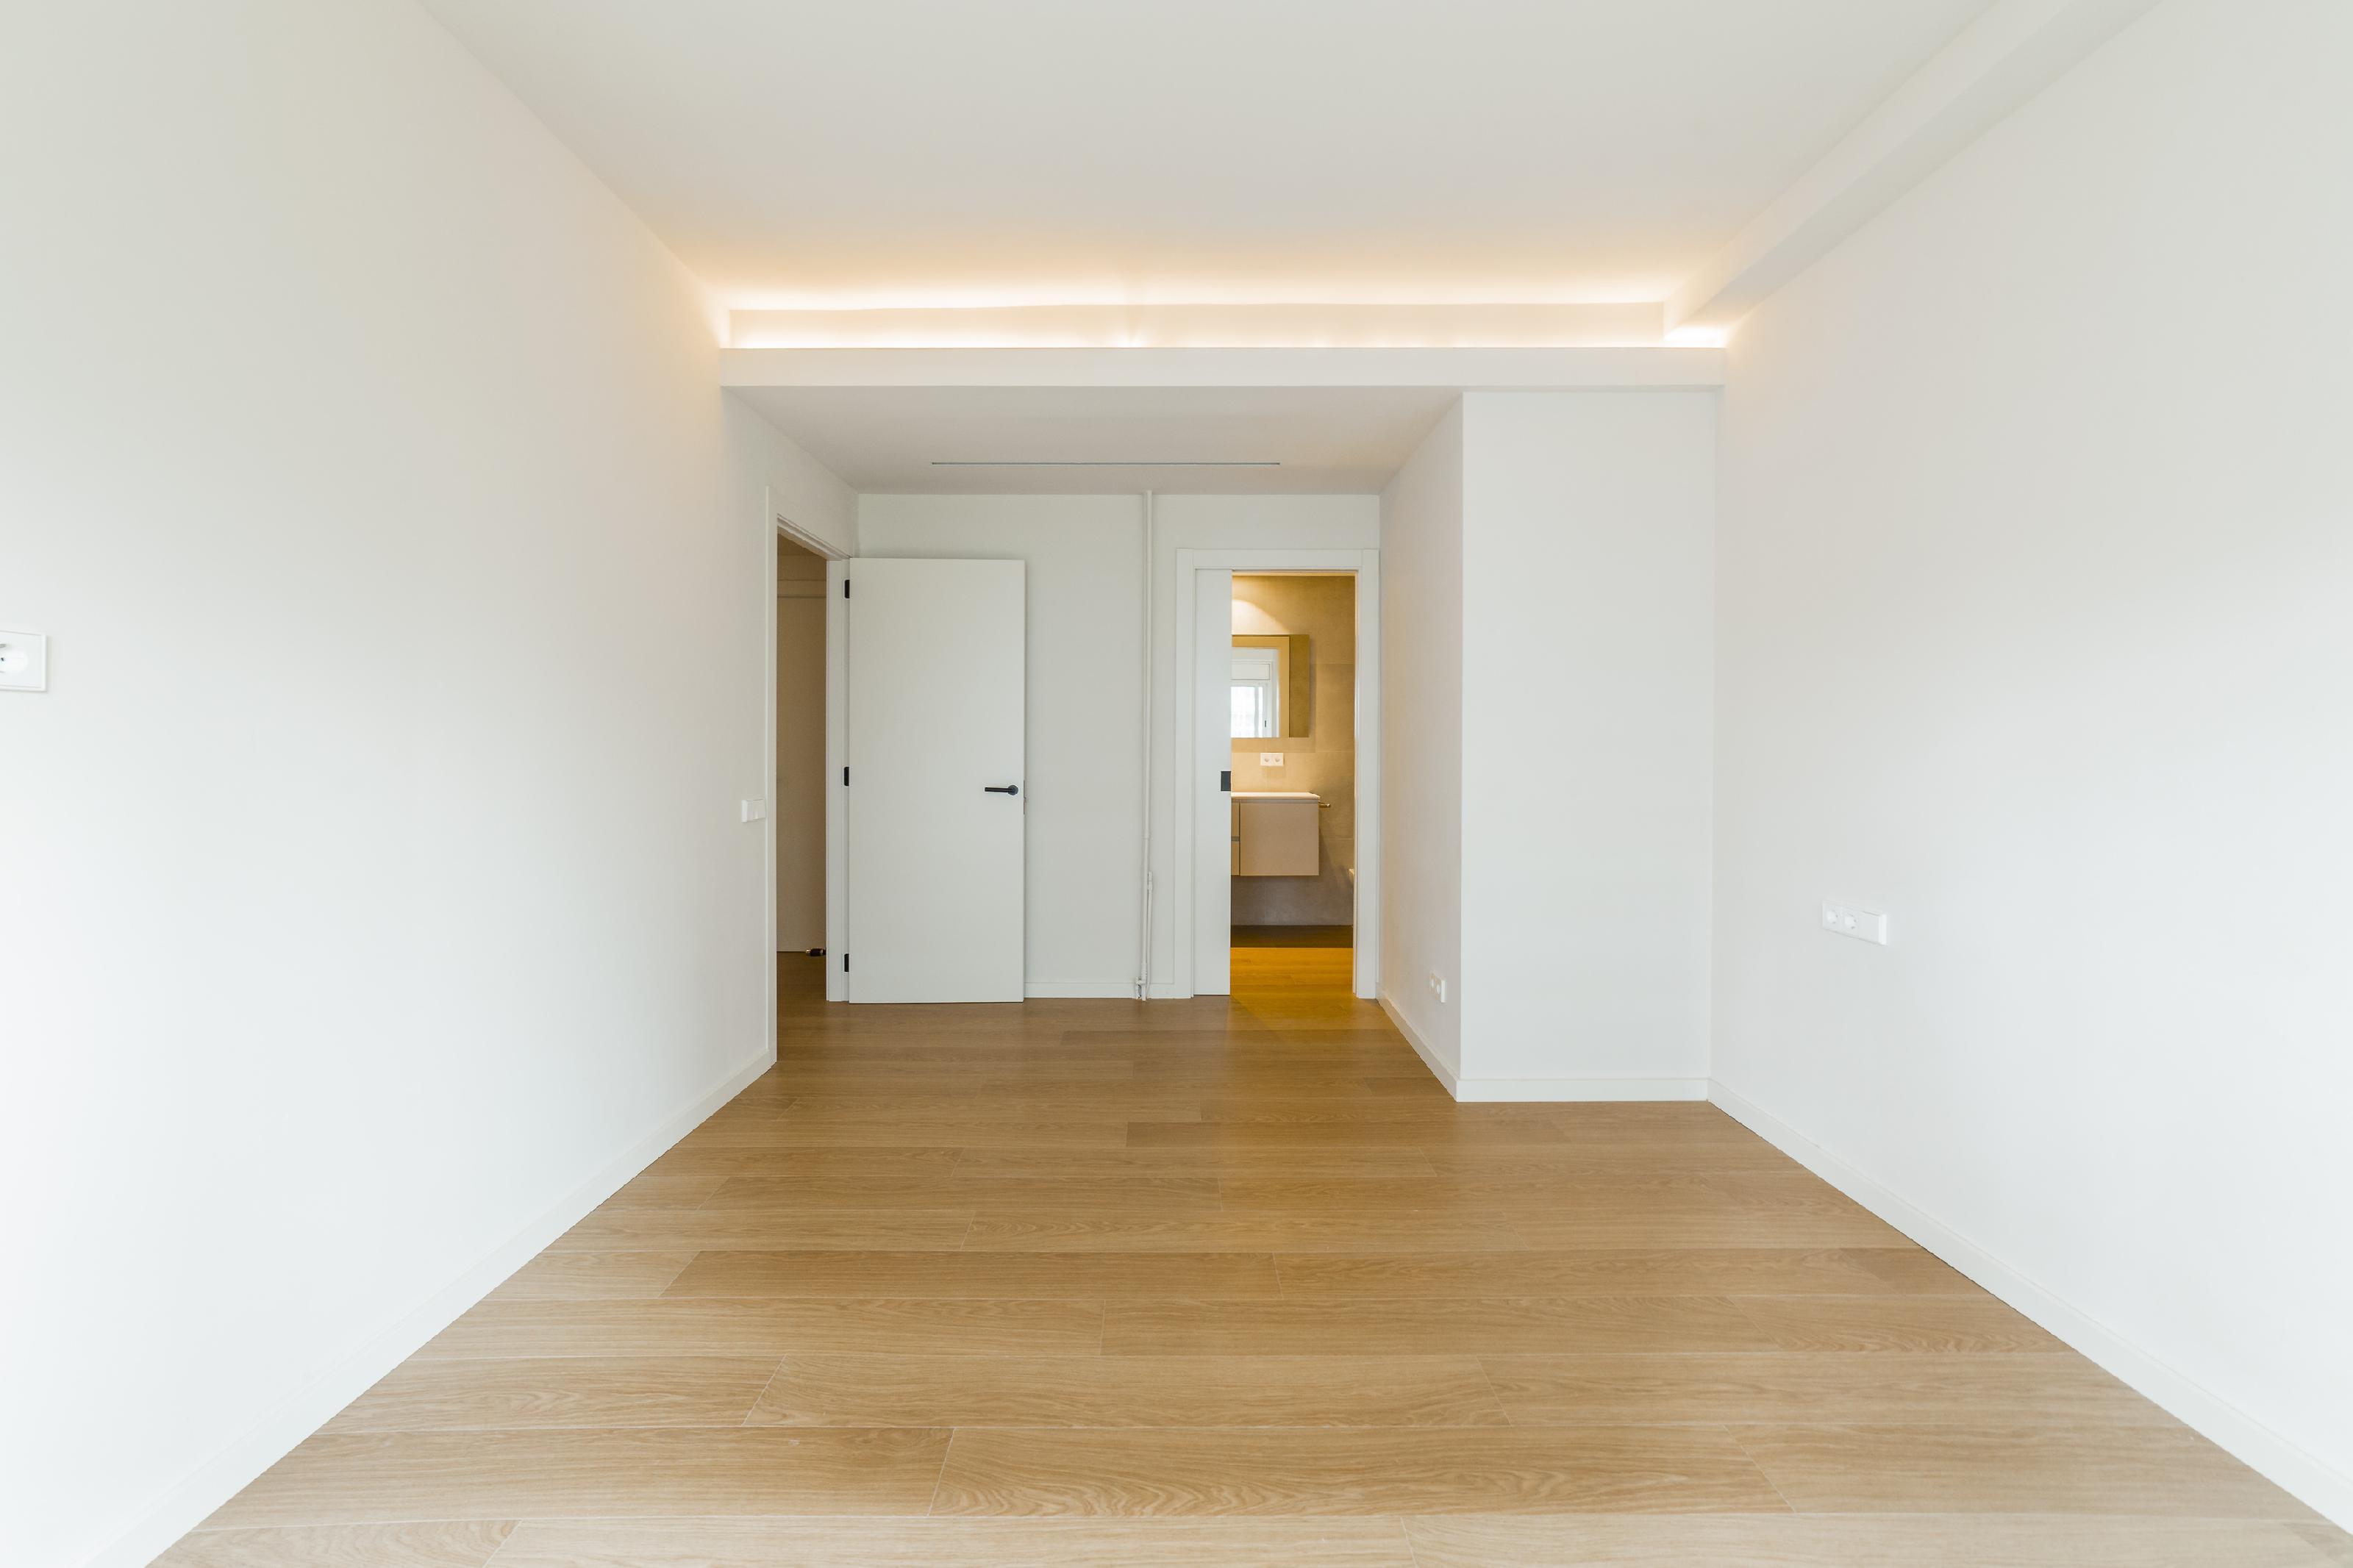 253492 Flat for sale in Sarrià-Sant Gervasi, Sant Gervasi-Galvany 44